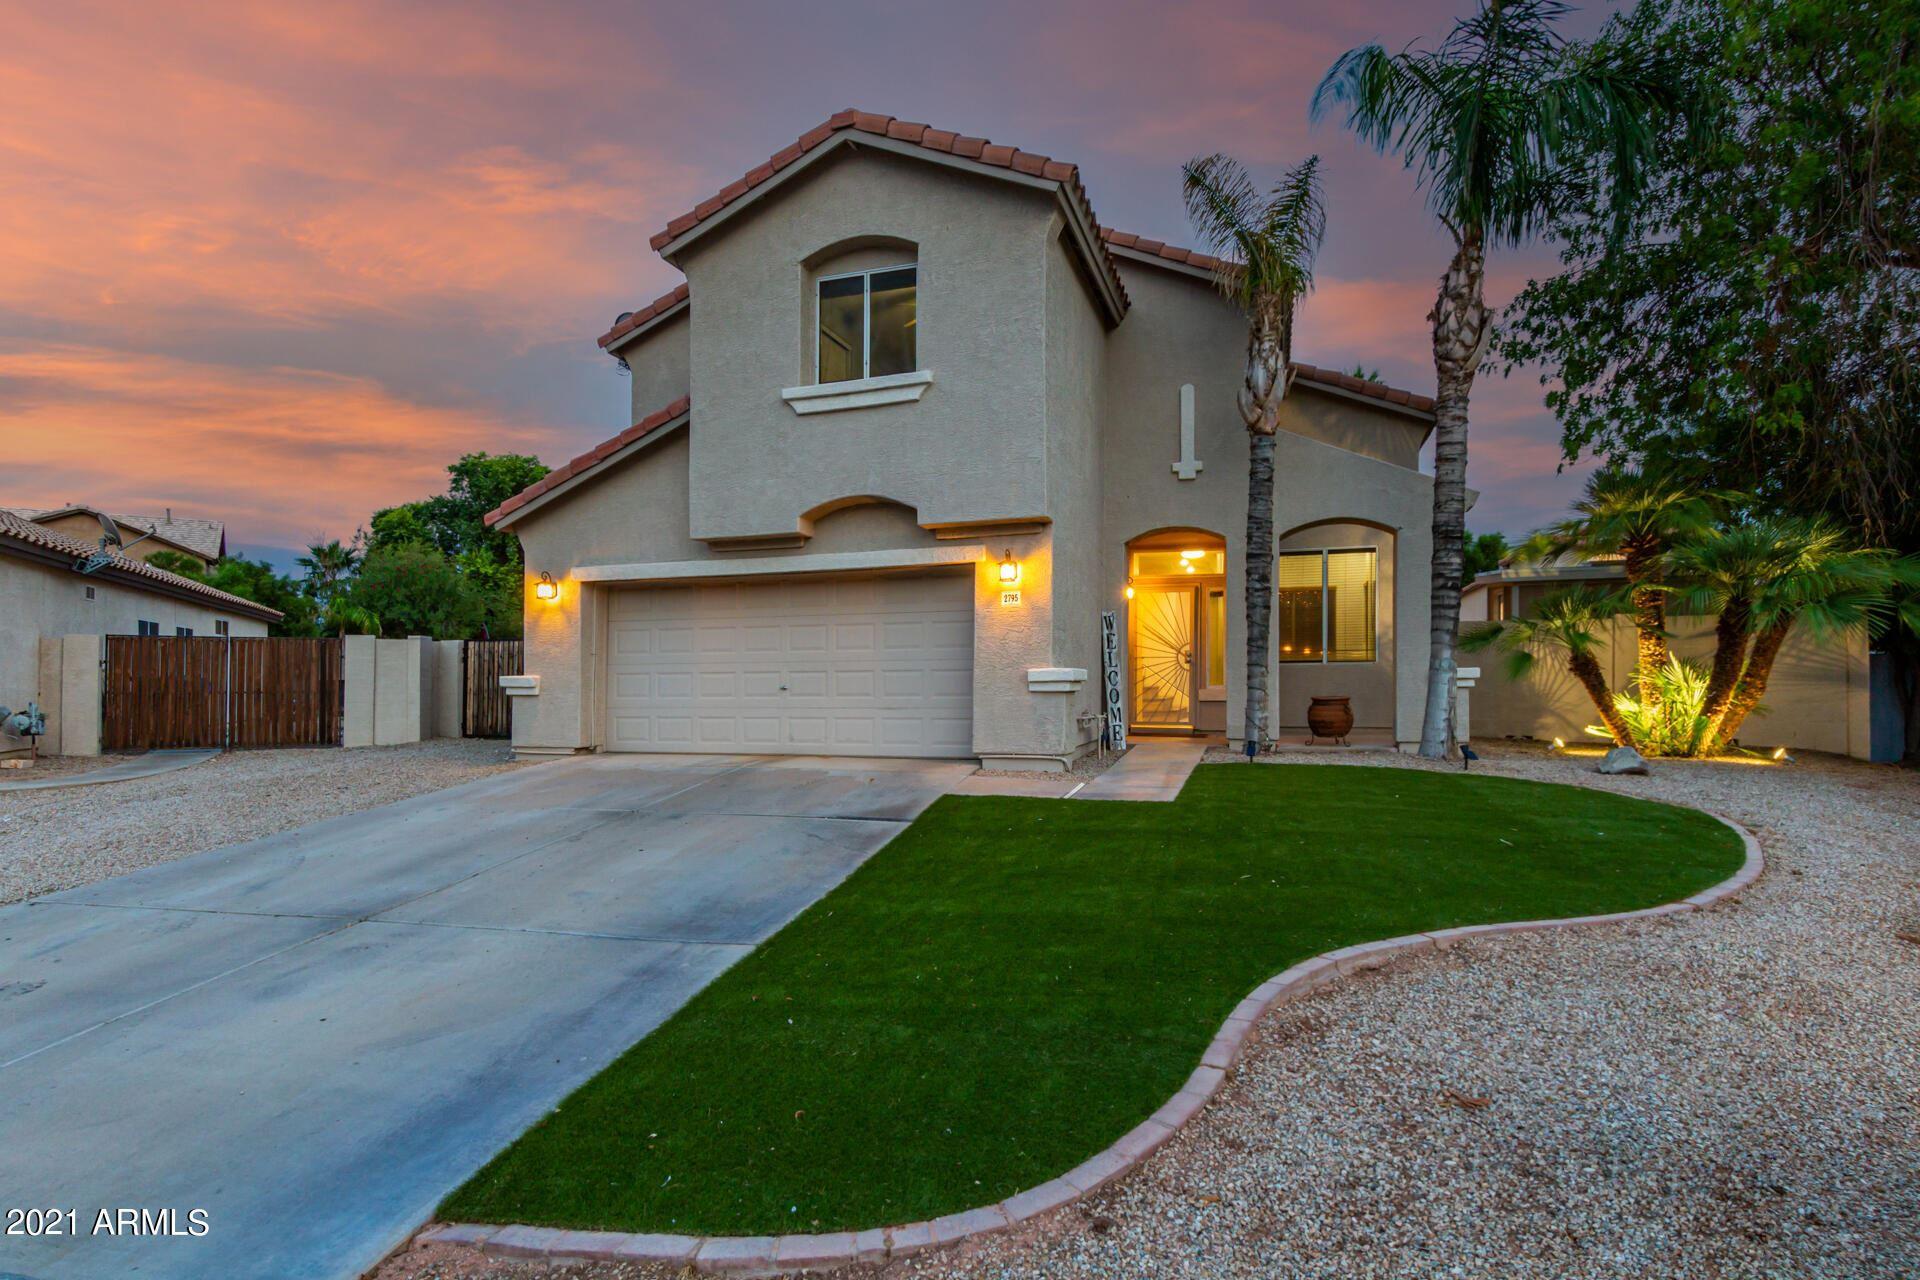 Photo of 2795 E GILA Court, Gilbert, AZ 85296 (MLS # 6307416)